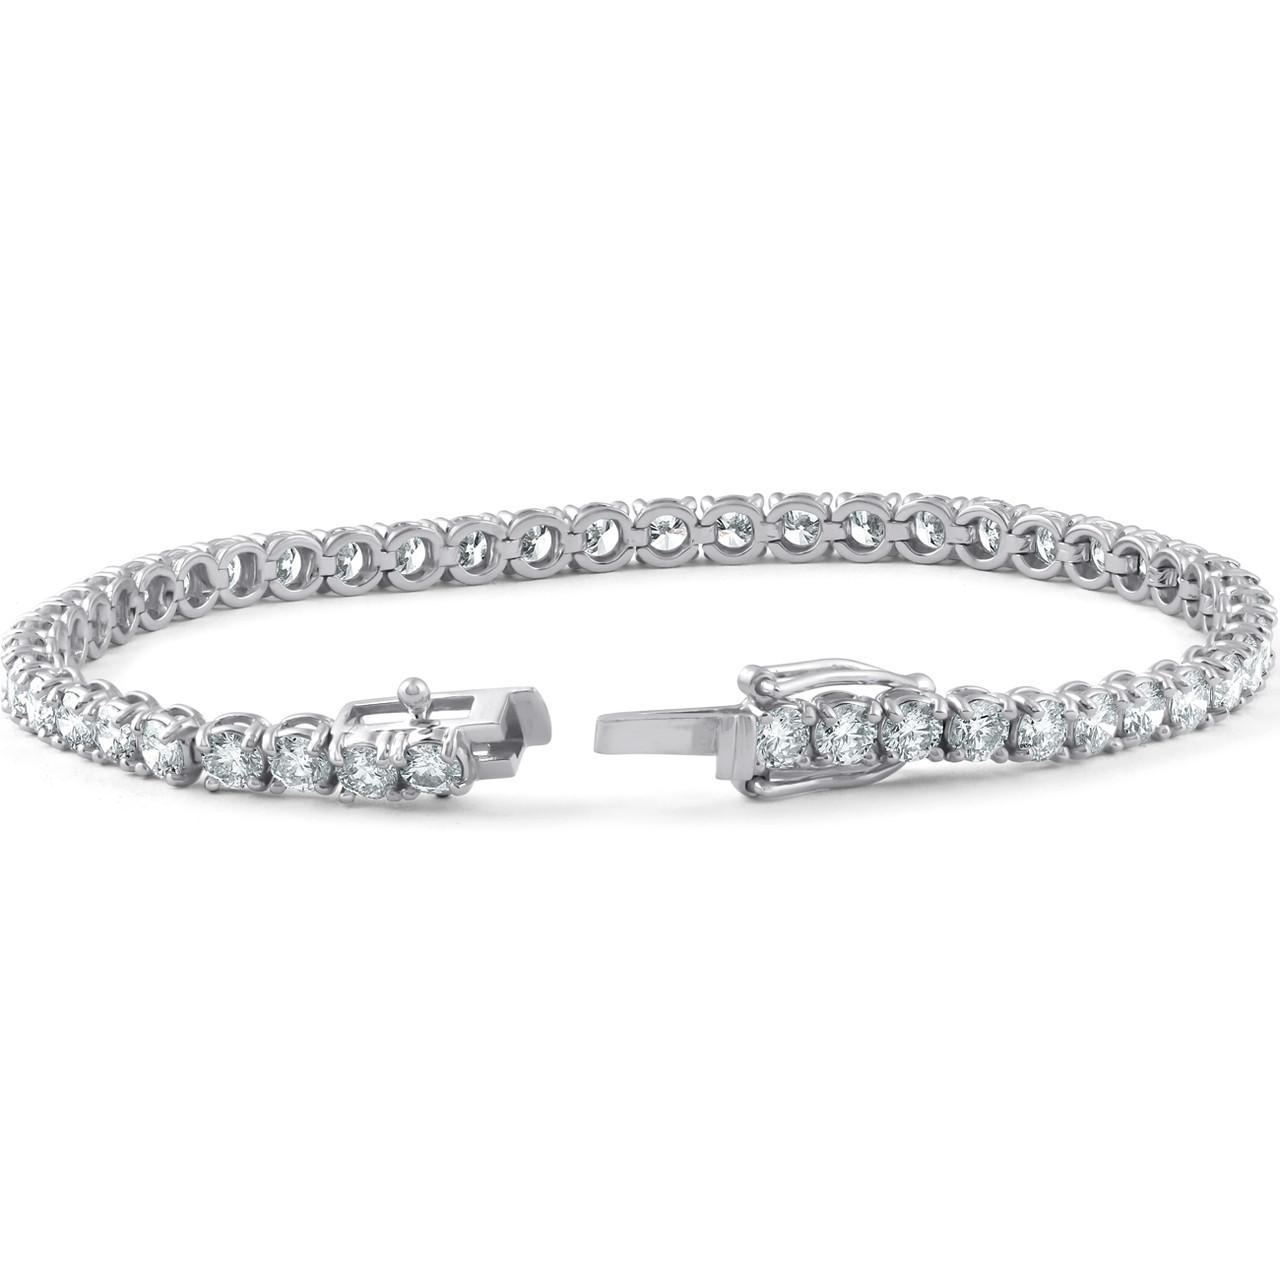 500a0bfda7b7c 7 Carat Round Lab Grown Diamond Tennis Bracelet 18K White Gold 7